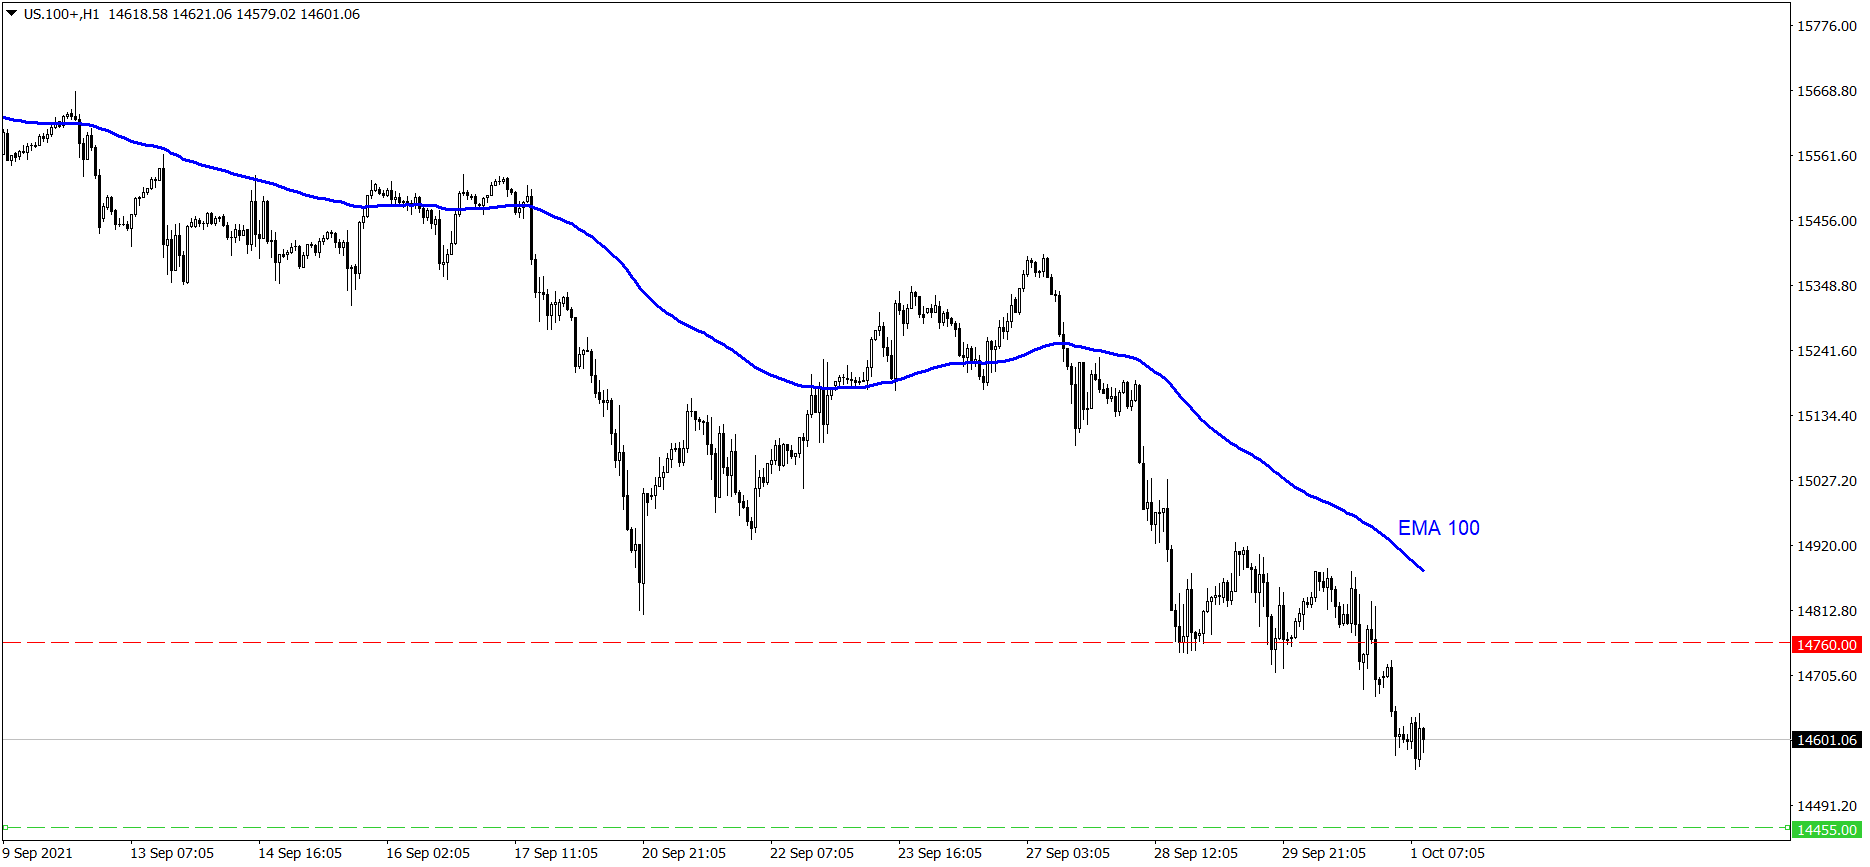 Analiza indeksu NASDAQ 100